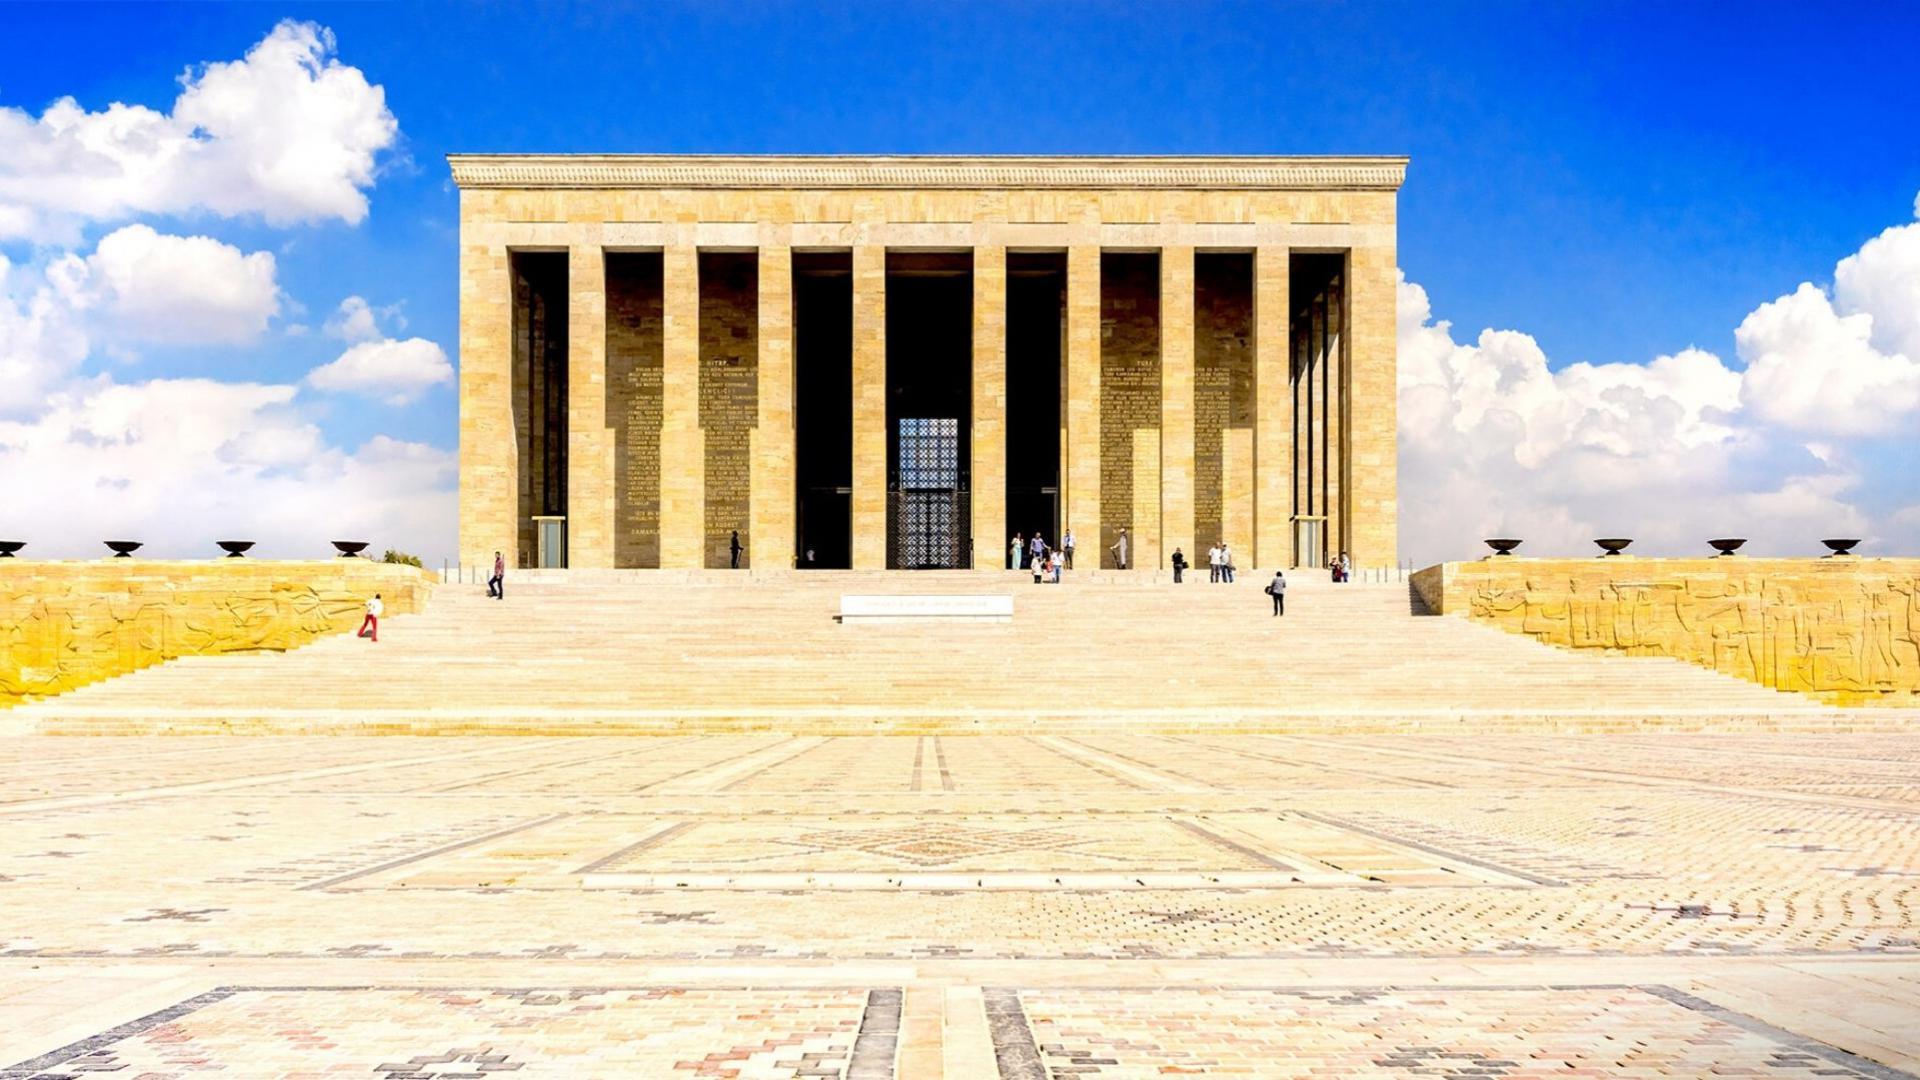 Ataturko muziejus - itin populiari lankytina vieta Ankaroje